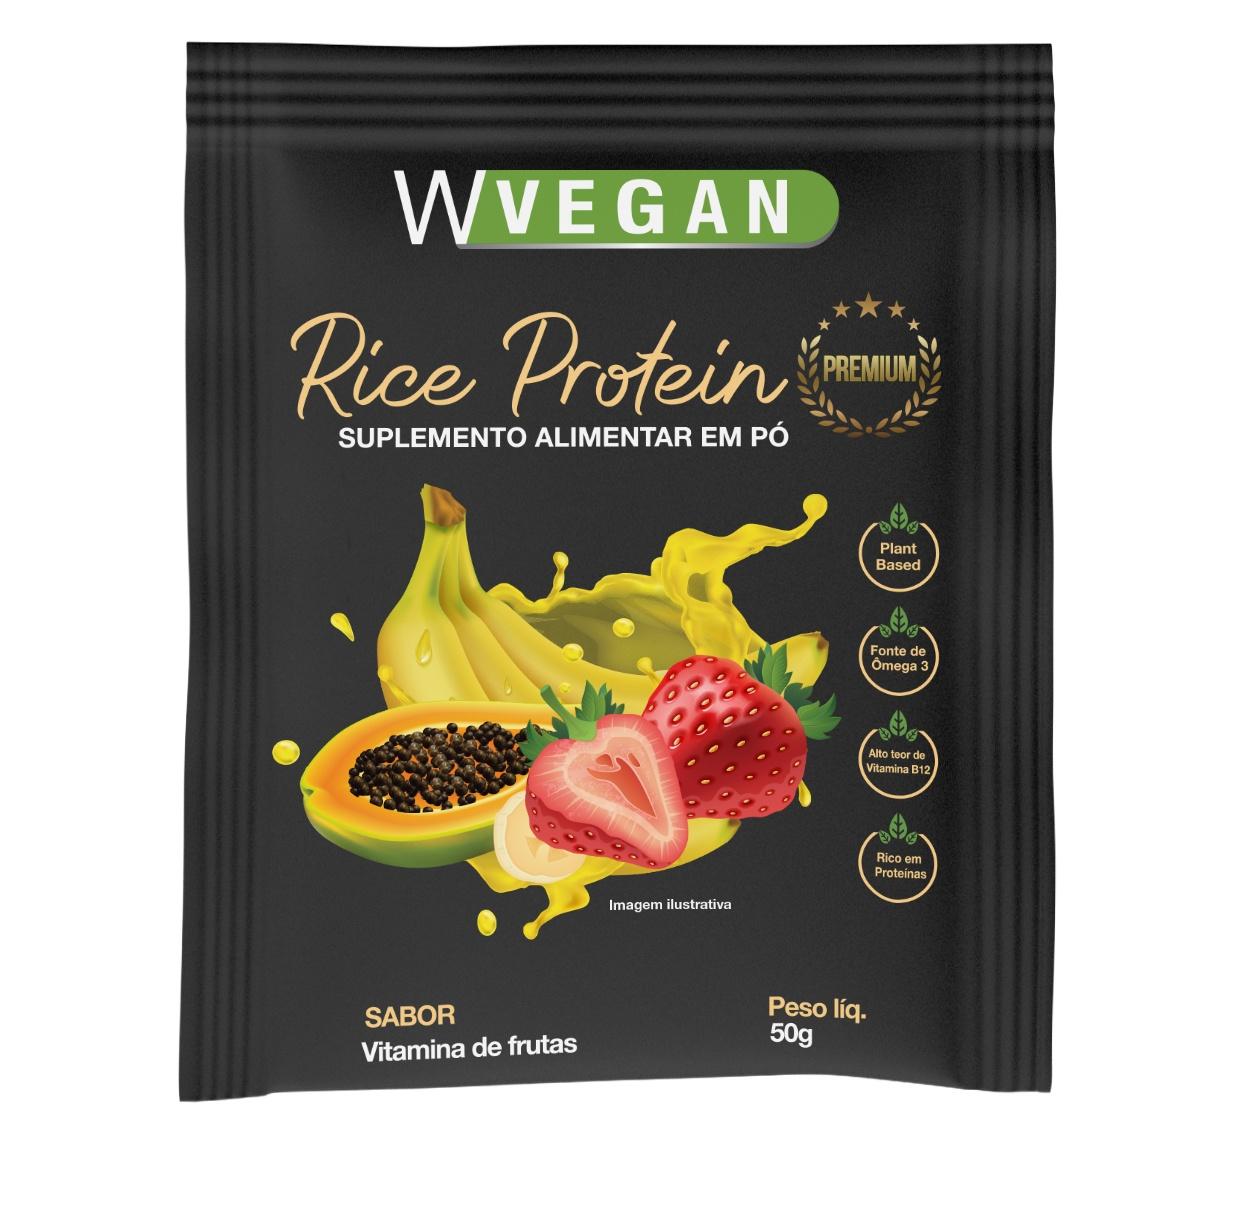 Rice Protein Premium 50g Sache Sabor Vitamina de Frutas WVegan